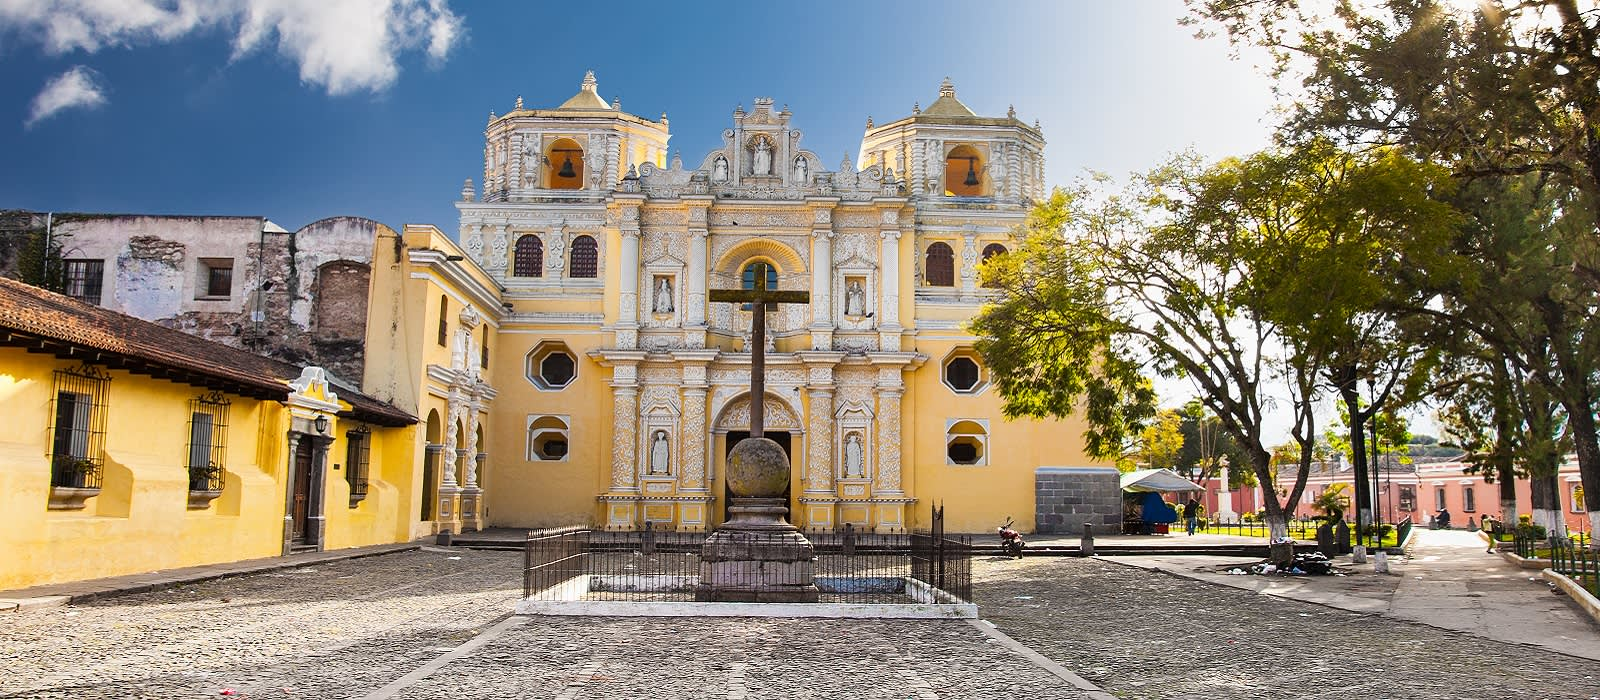 History of Guatemala - Enchanting Travels Guatemala Tours La Merced church in central park of Antigua